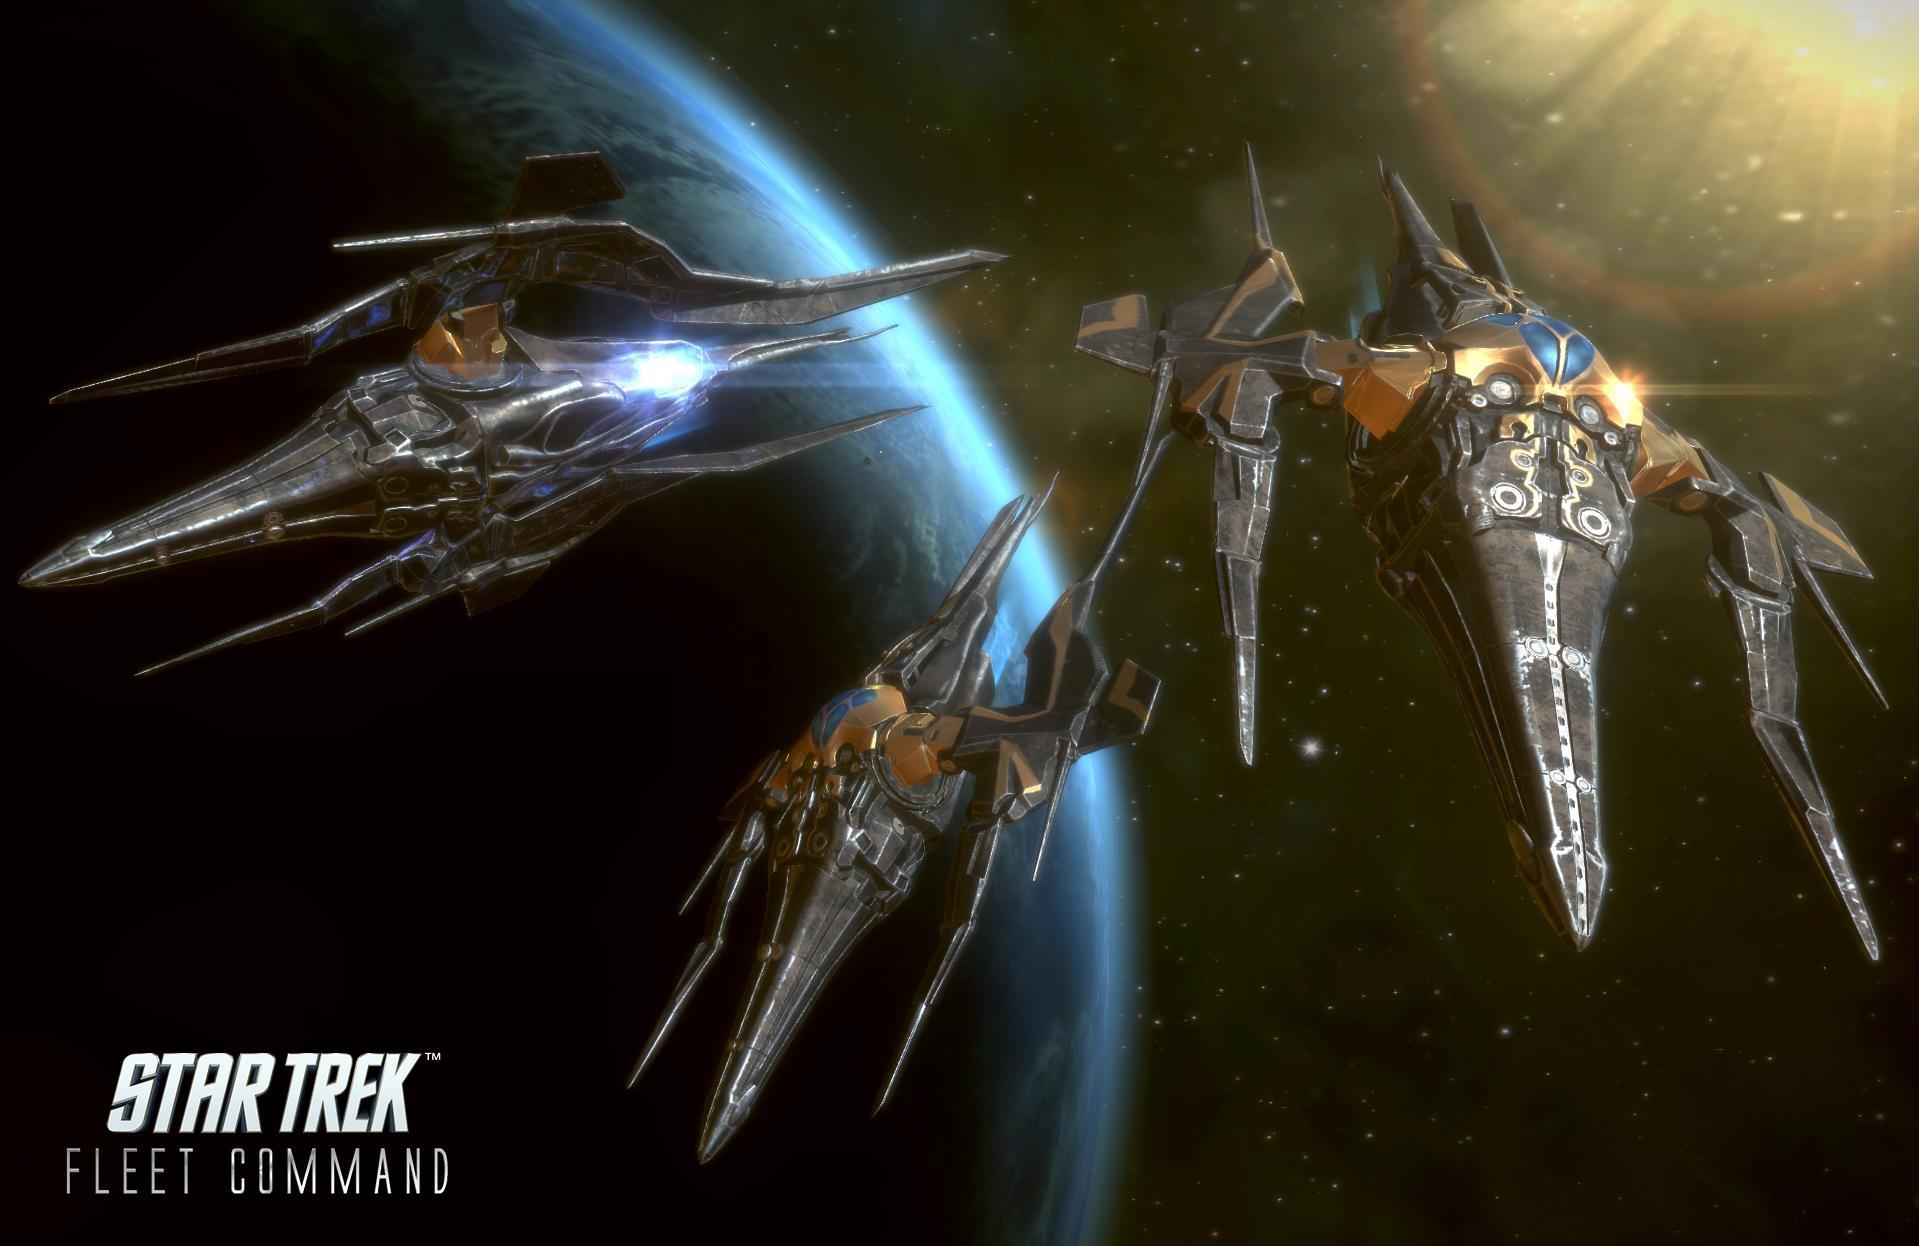 The Swarm | Star Trek: Fleet Command Wiki | FANDOM powered